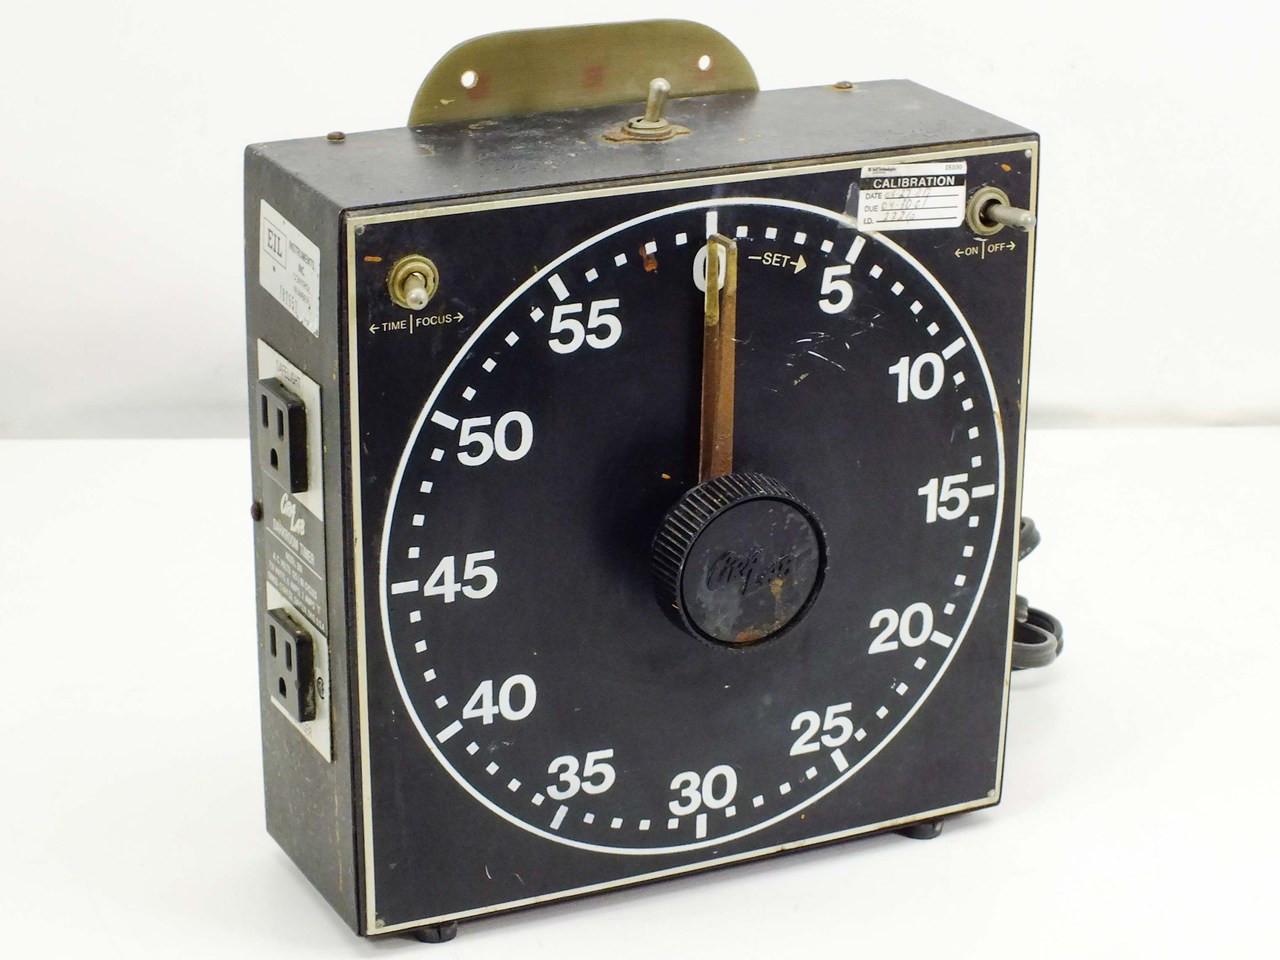 dimco gray 300 gralab darkroom timer 1.40__08268.1490111102?c=2 dimco gray 300 gralab darkroom timer recycledgoods com  at soozxer.org